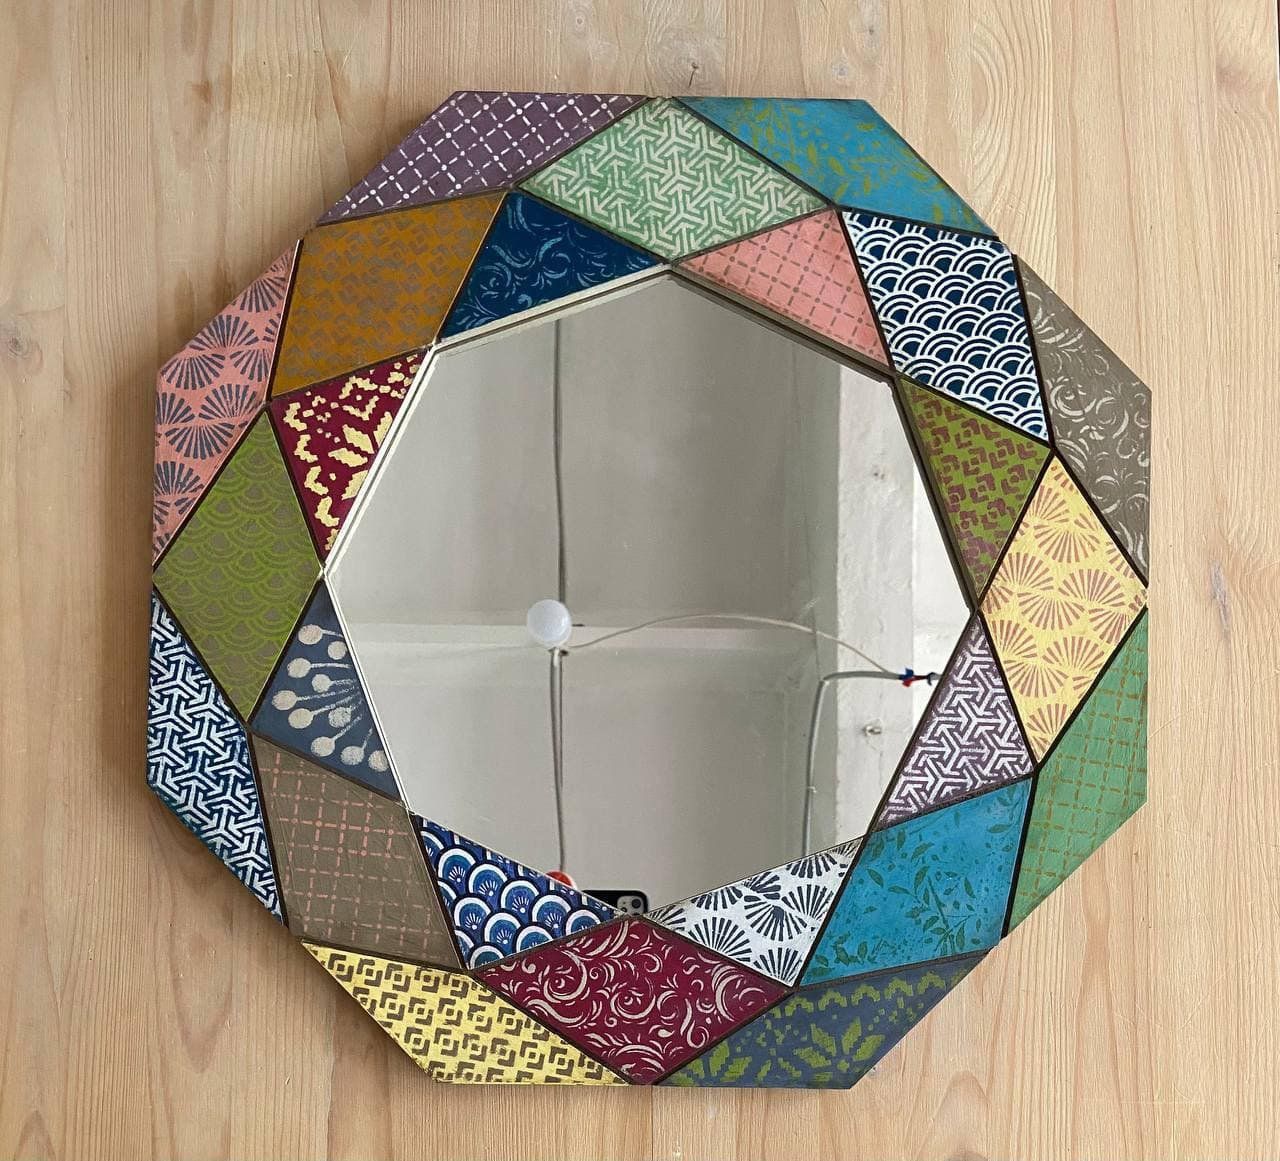 Зеркало «Пэчворк» | 26 сент 11:00